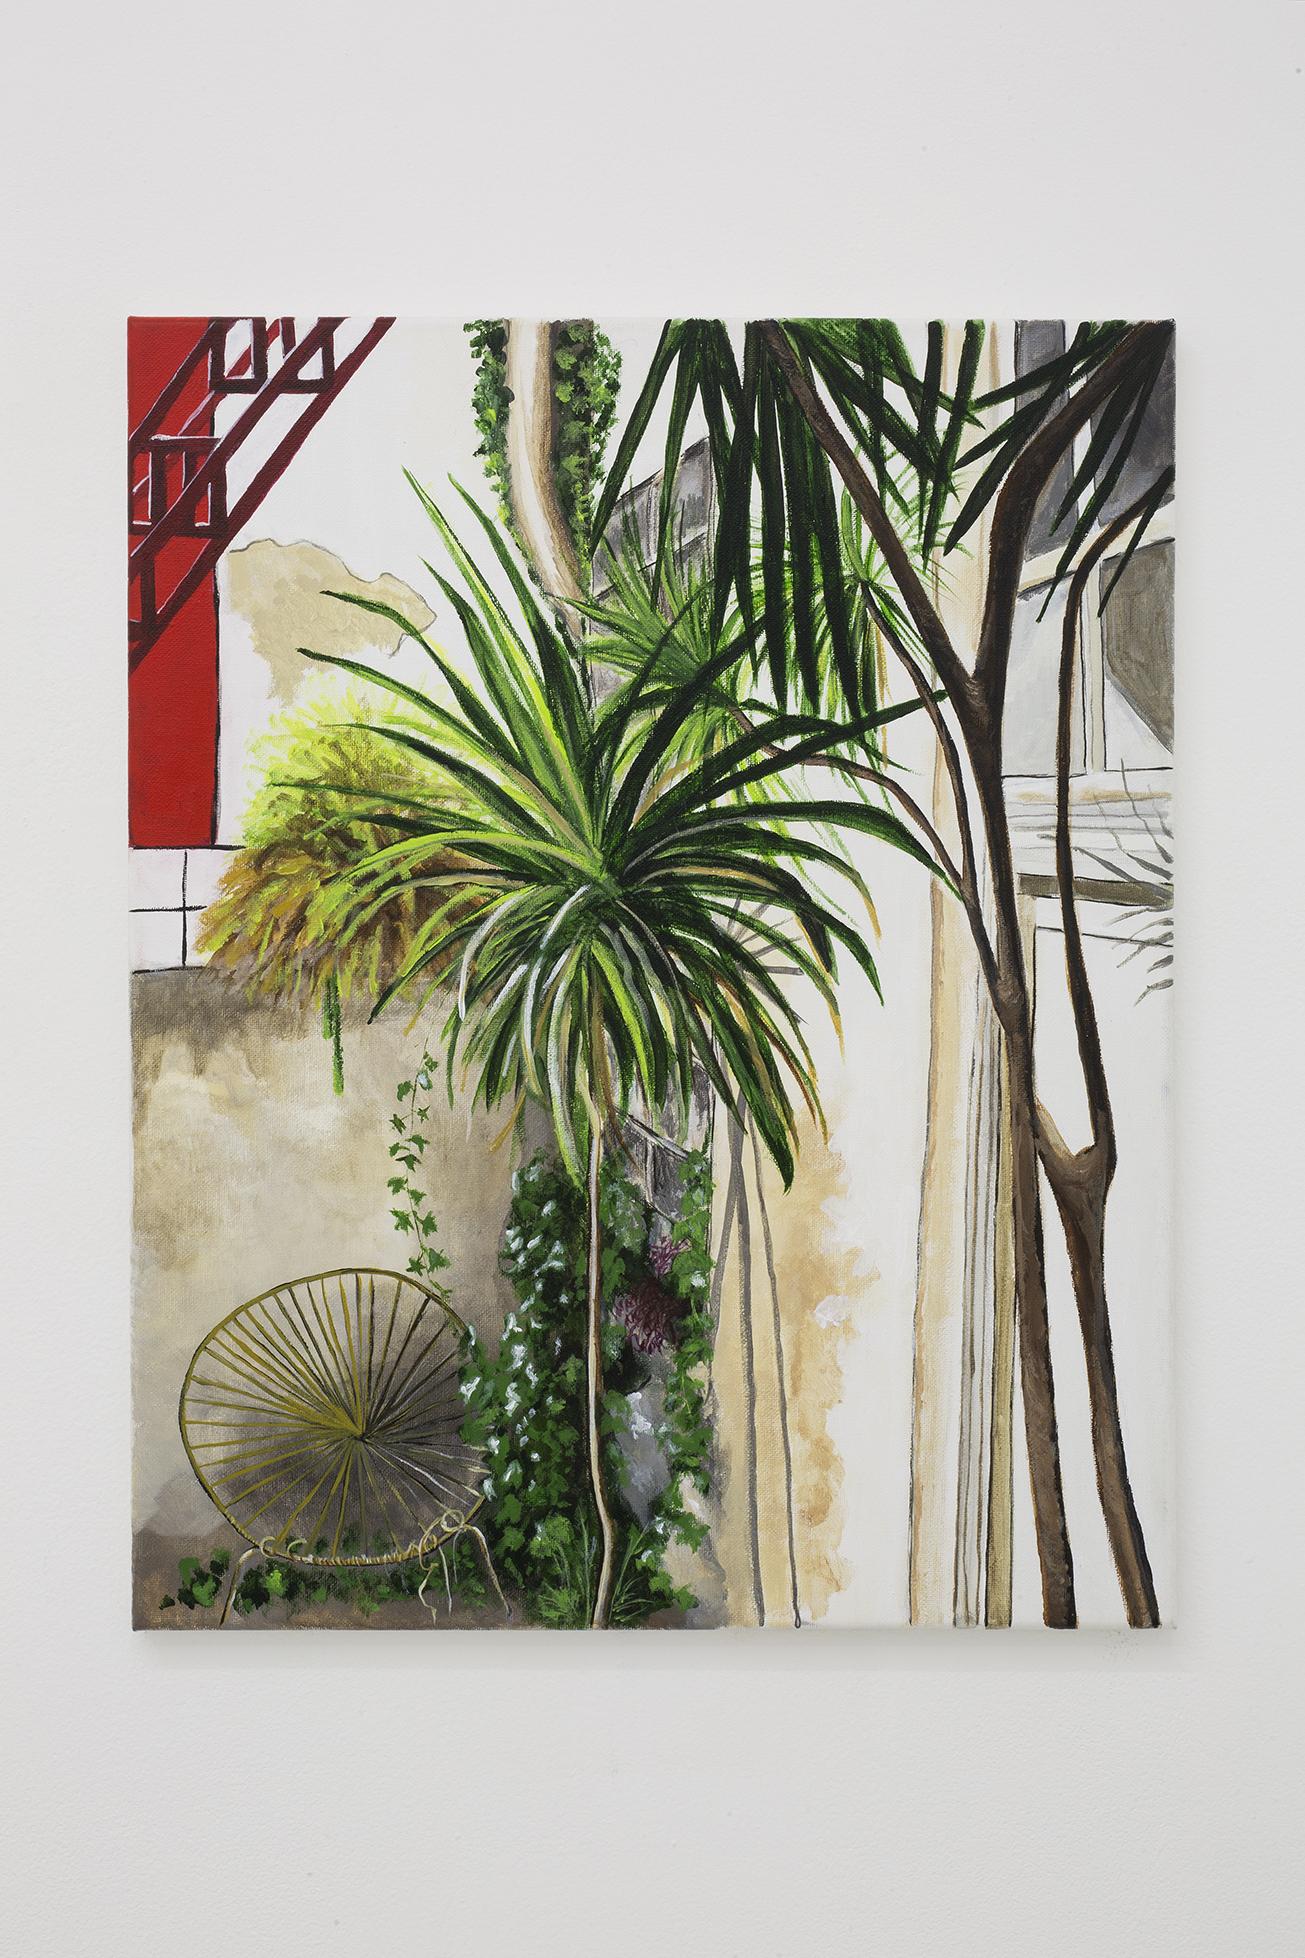 Shana Sharp, Two Coconuts, 2017. Acrylic on canvas.  11 x 14 inch (27.94 x 35.56 cm)